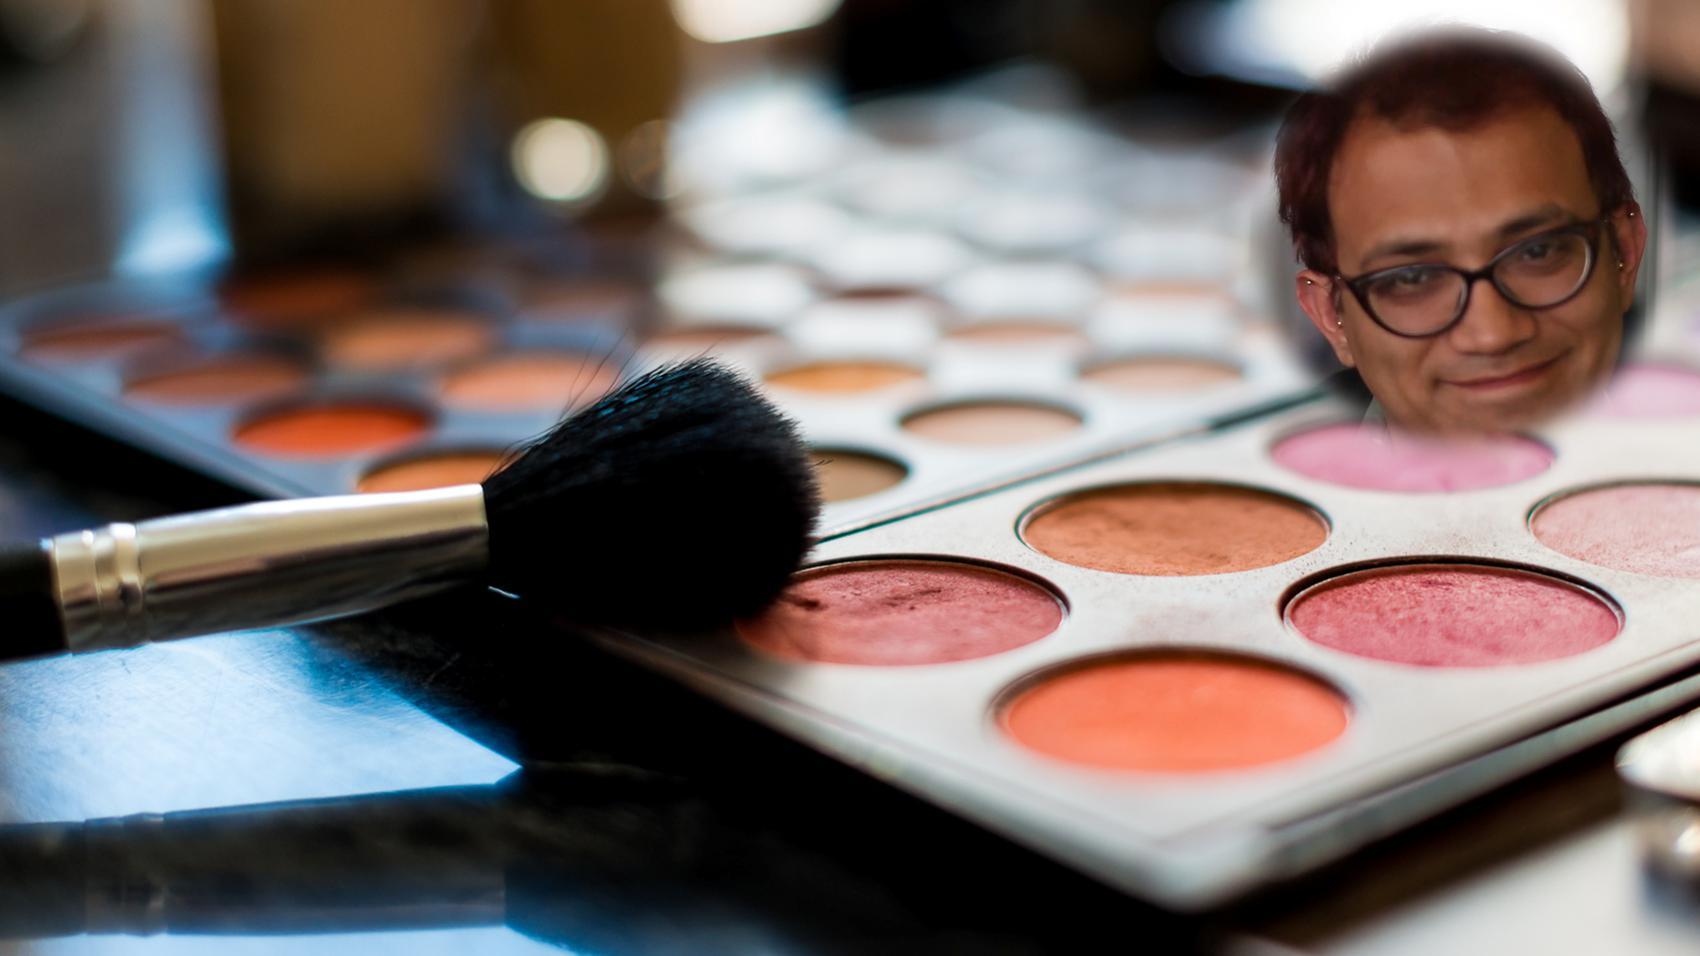 Career in Makeup Artistry